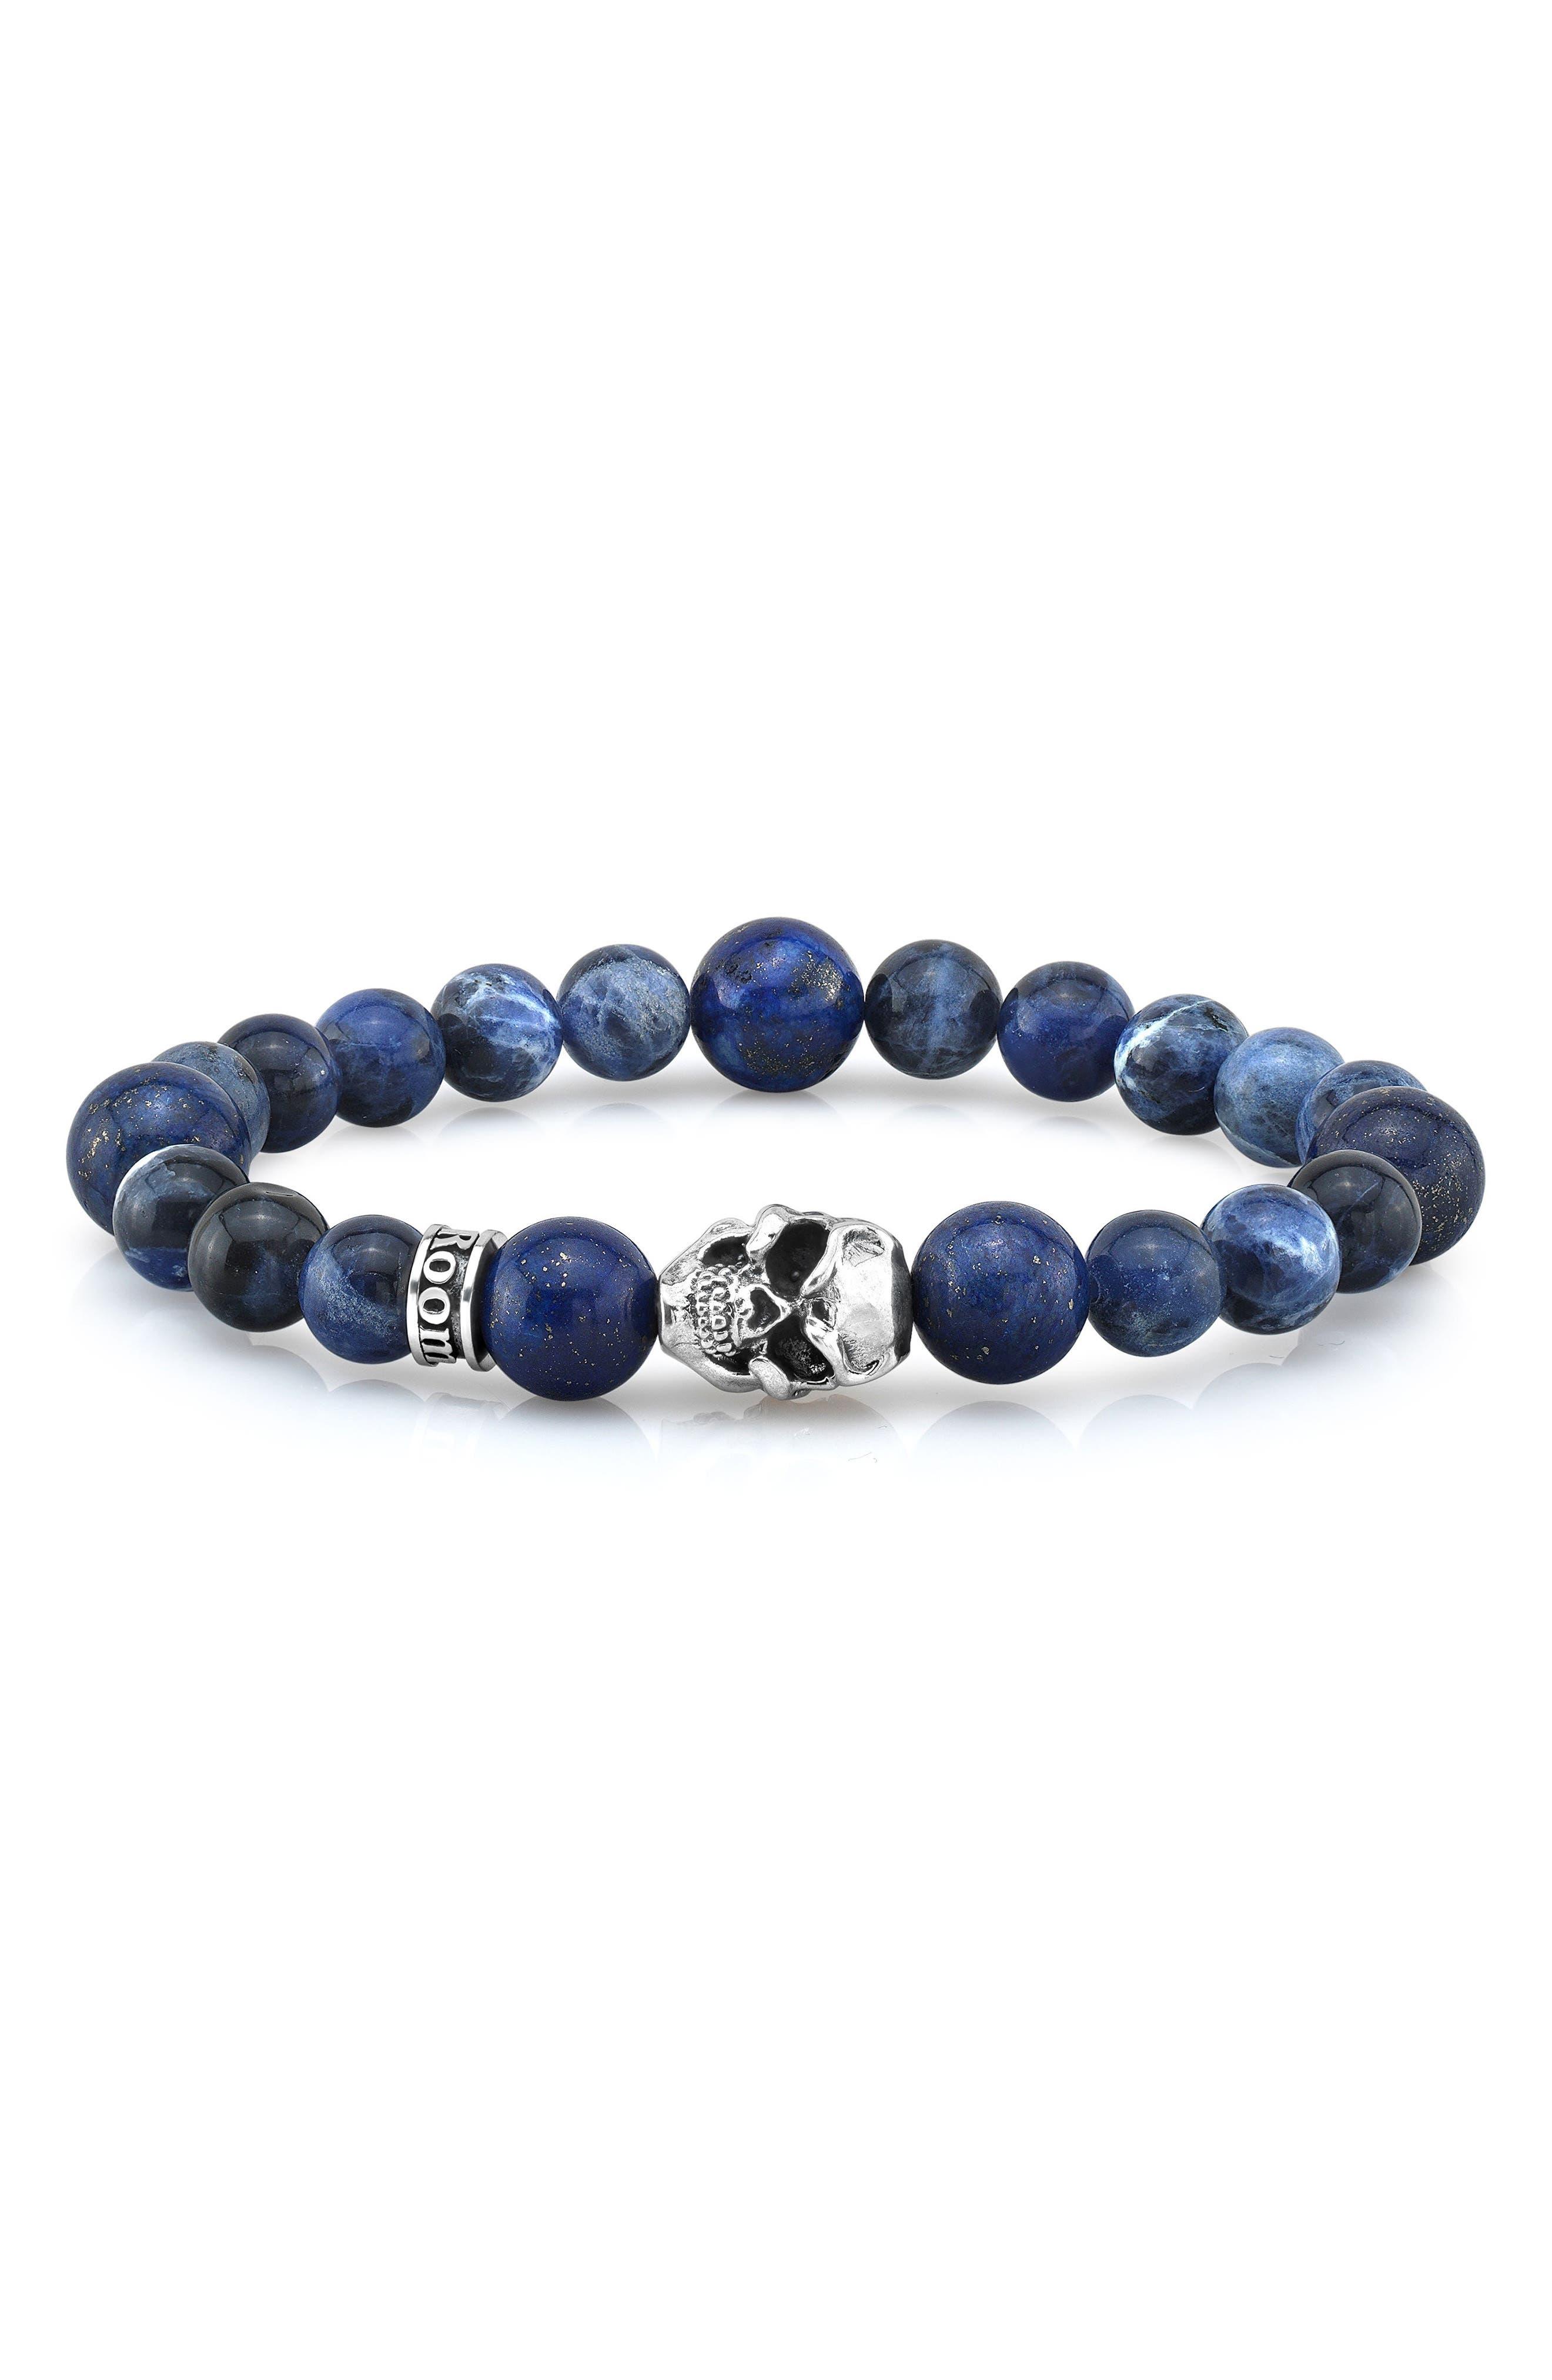 Sodalite & Lapis Lazuli Bead Bracelet,                         Main,                         color, 401